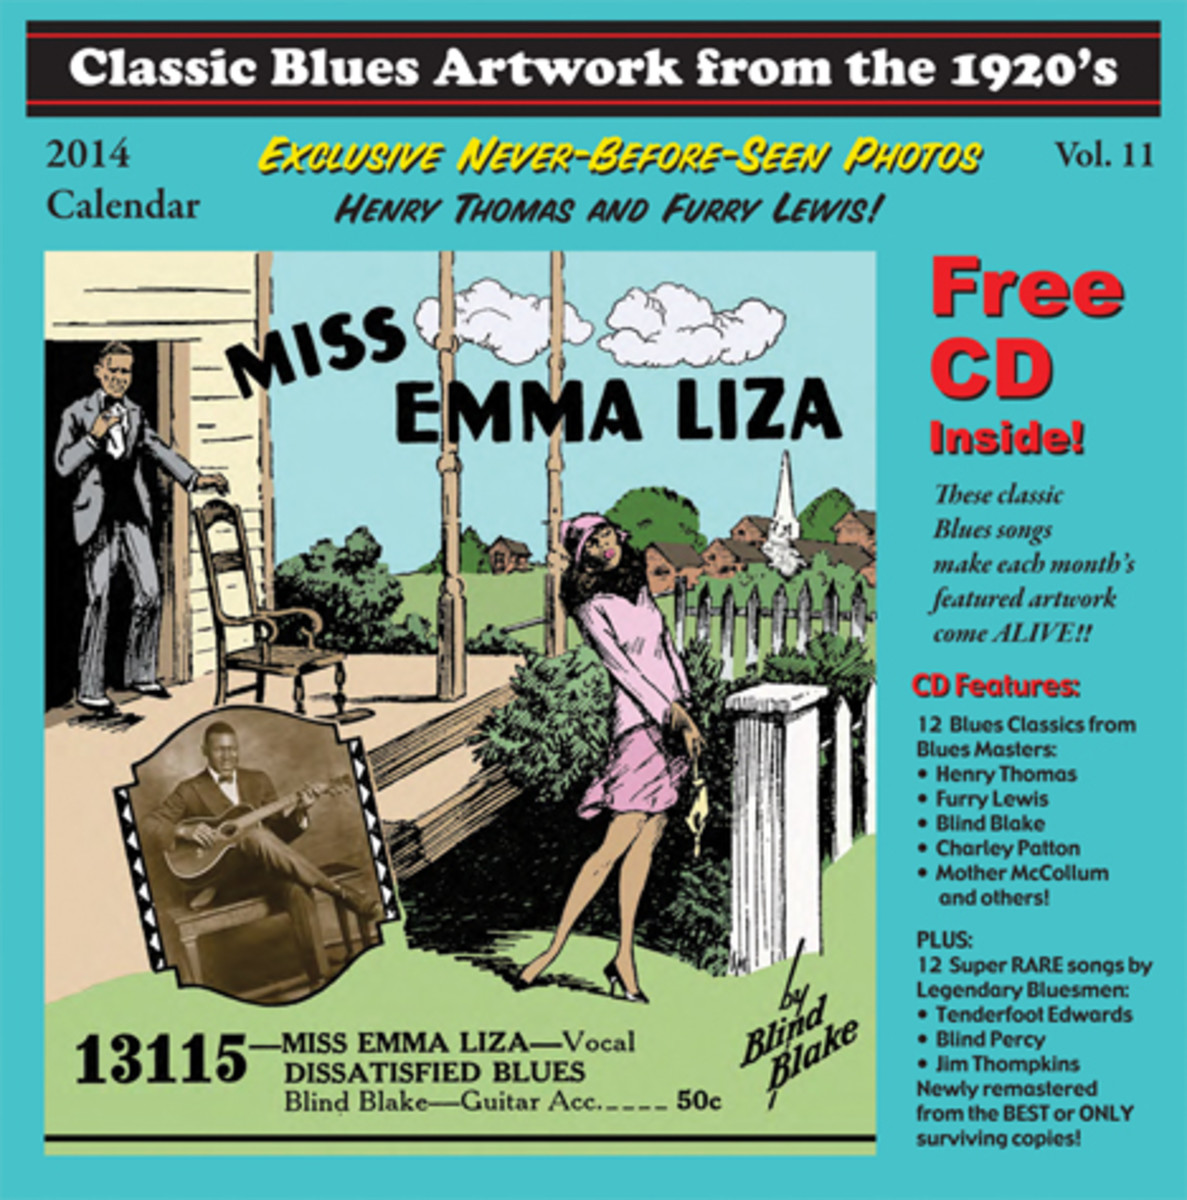 John Tefteller's 2014 blues calendar